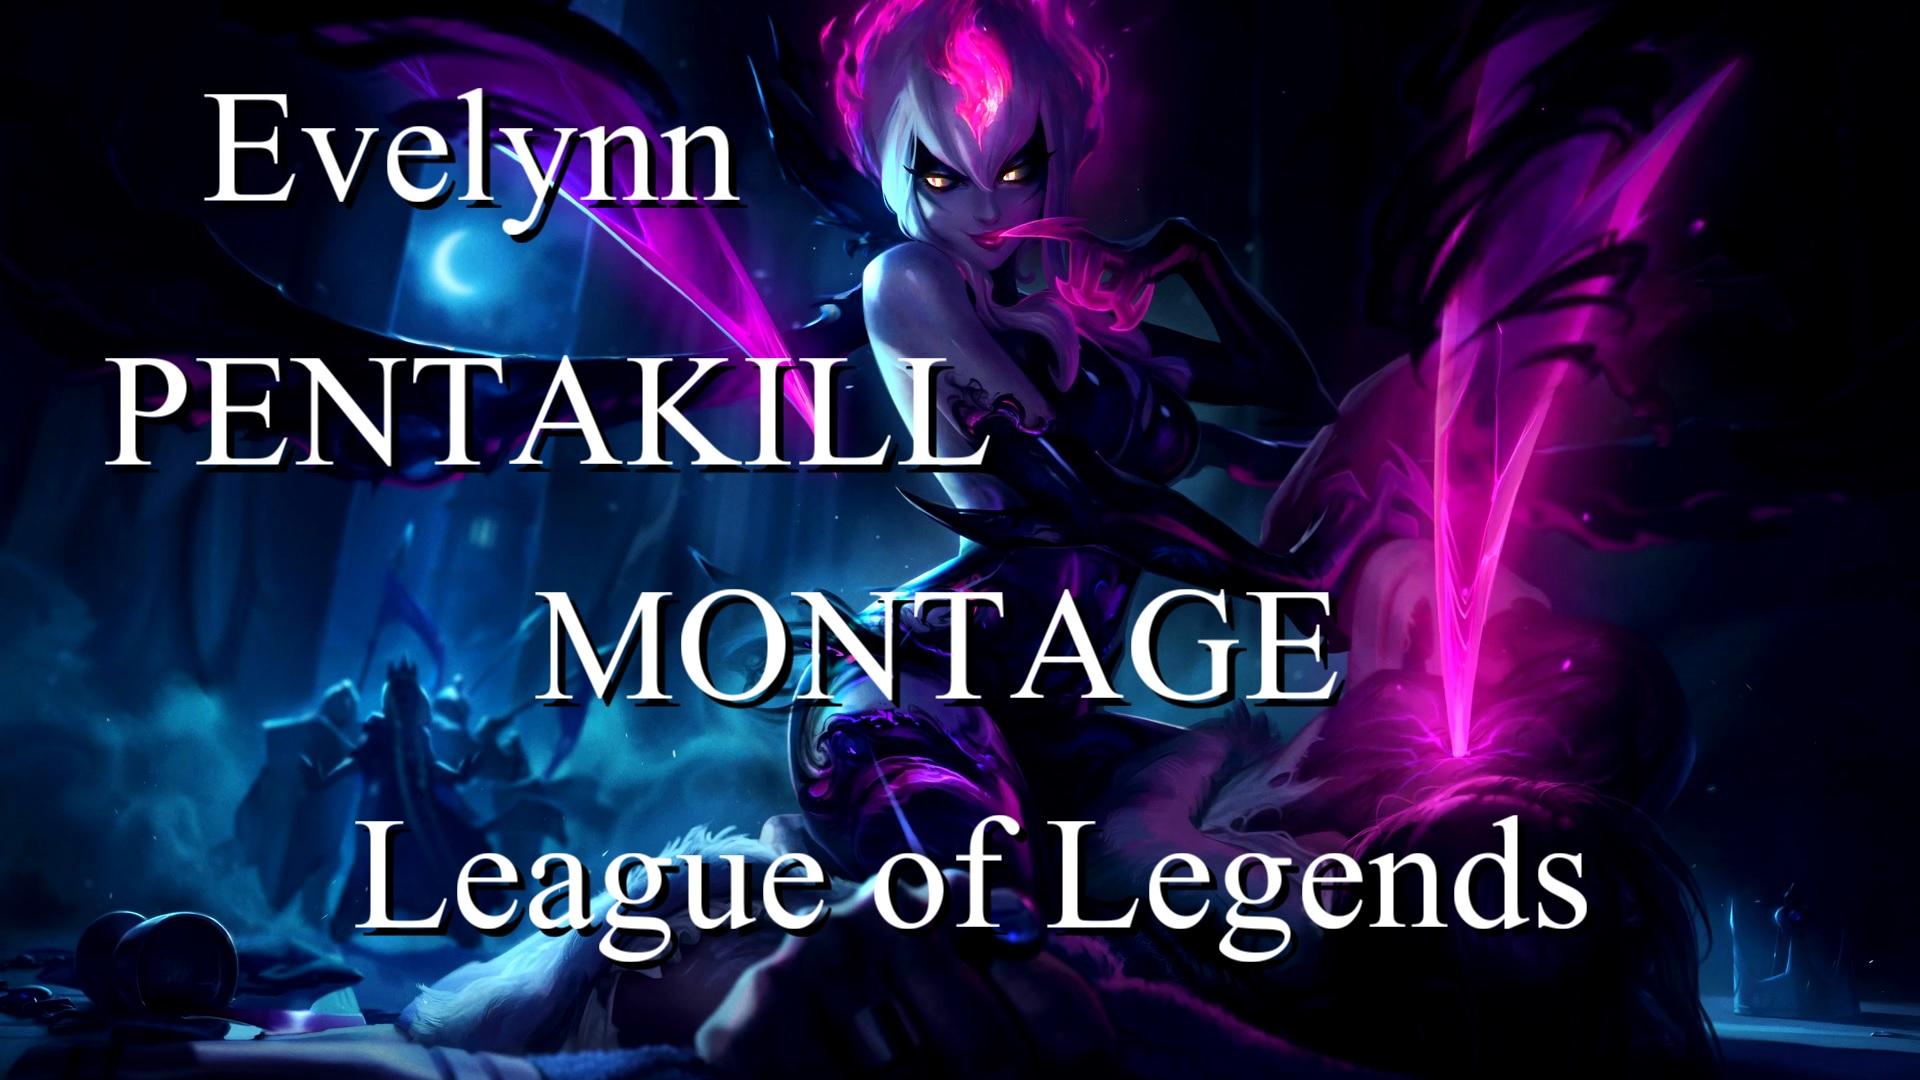 evelynn-pentakill-montage-preseason8